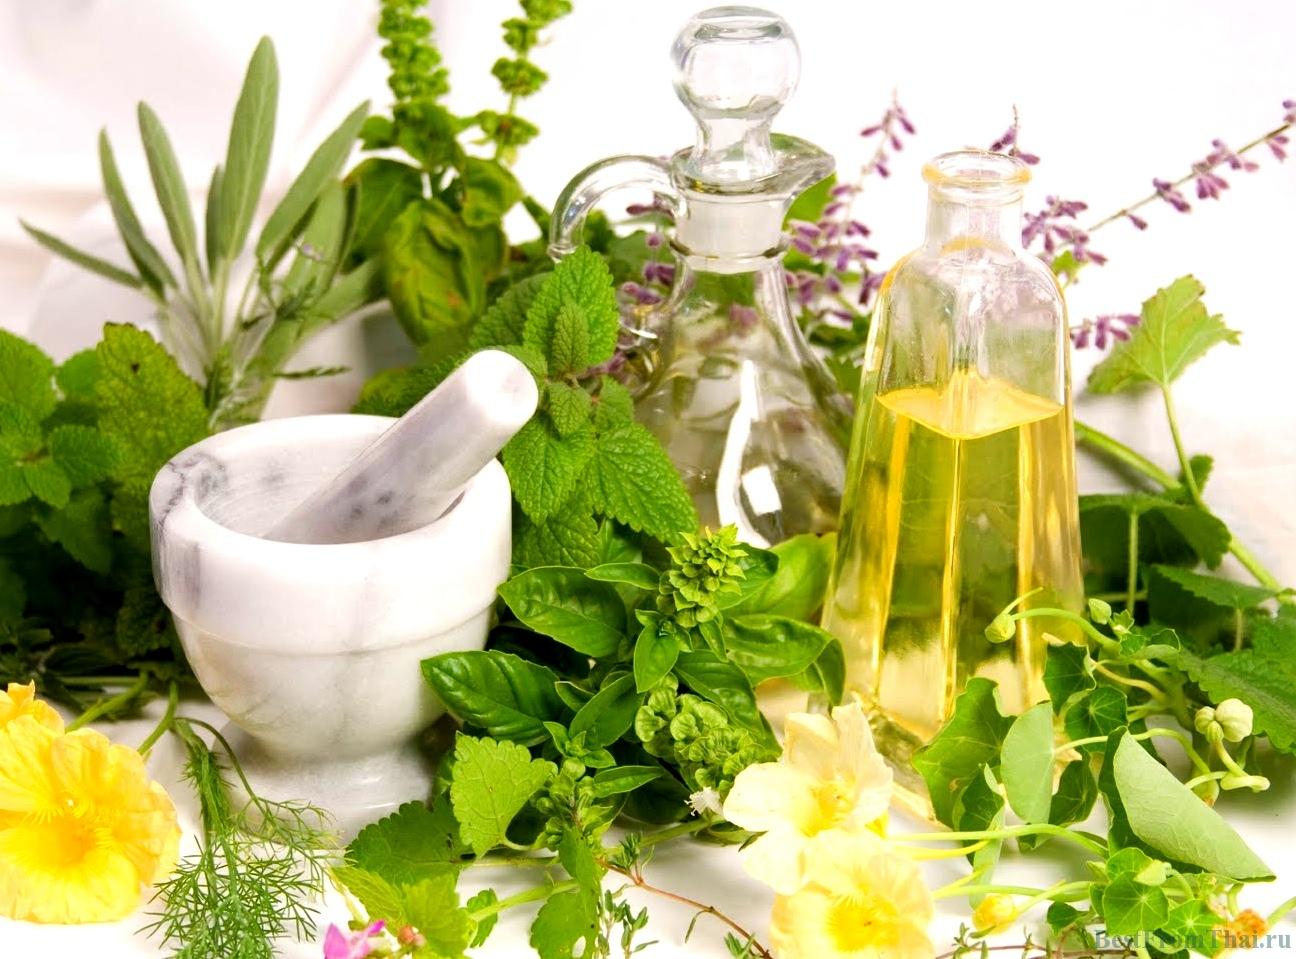 iStock herbs oils Натуральная медицина: ОБОСТРЕНИЯ